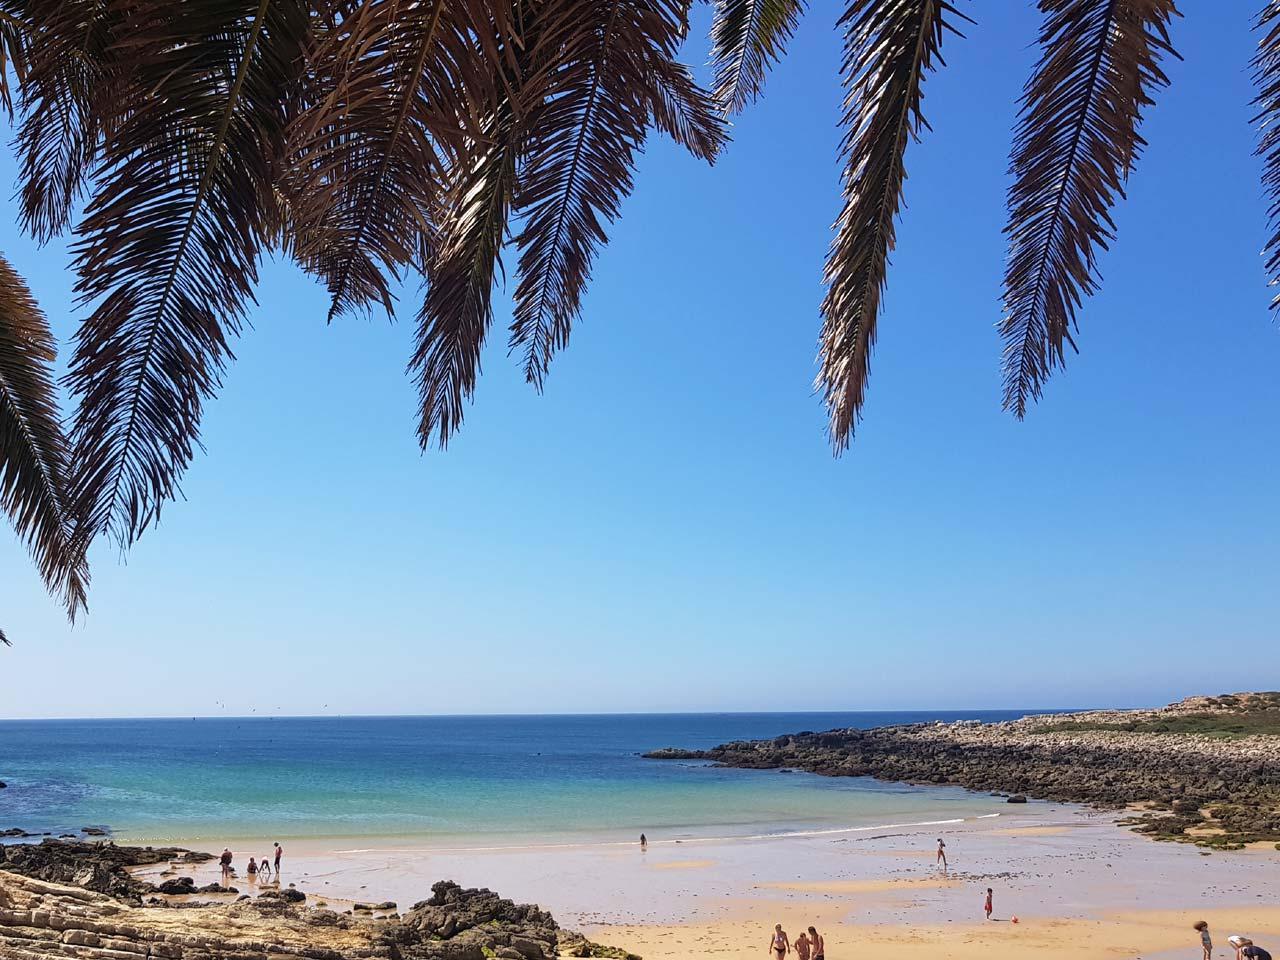 Campingurlaub in Portugal oder Südsee? Manchmal weiß man es gar nicht so genau!